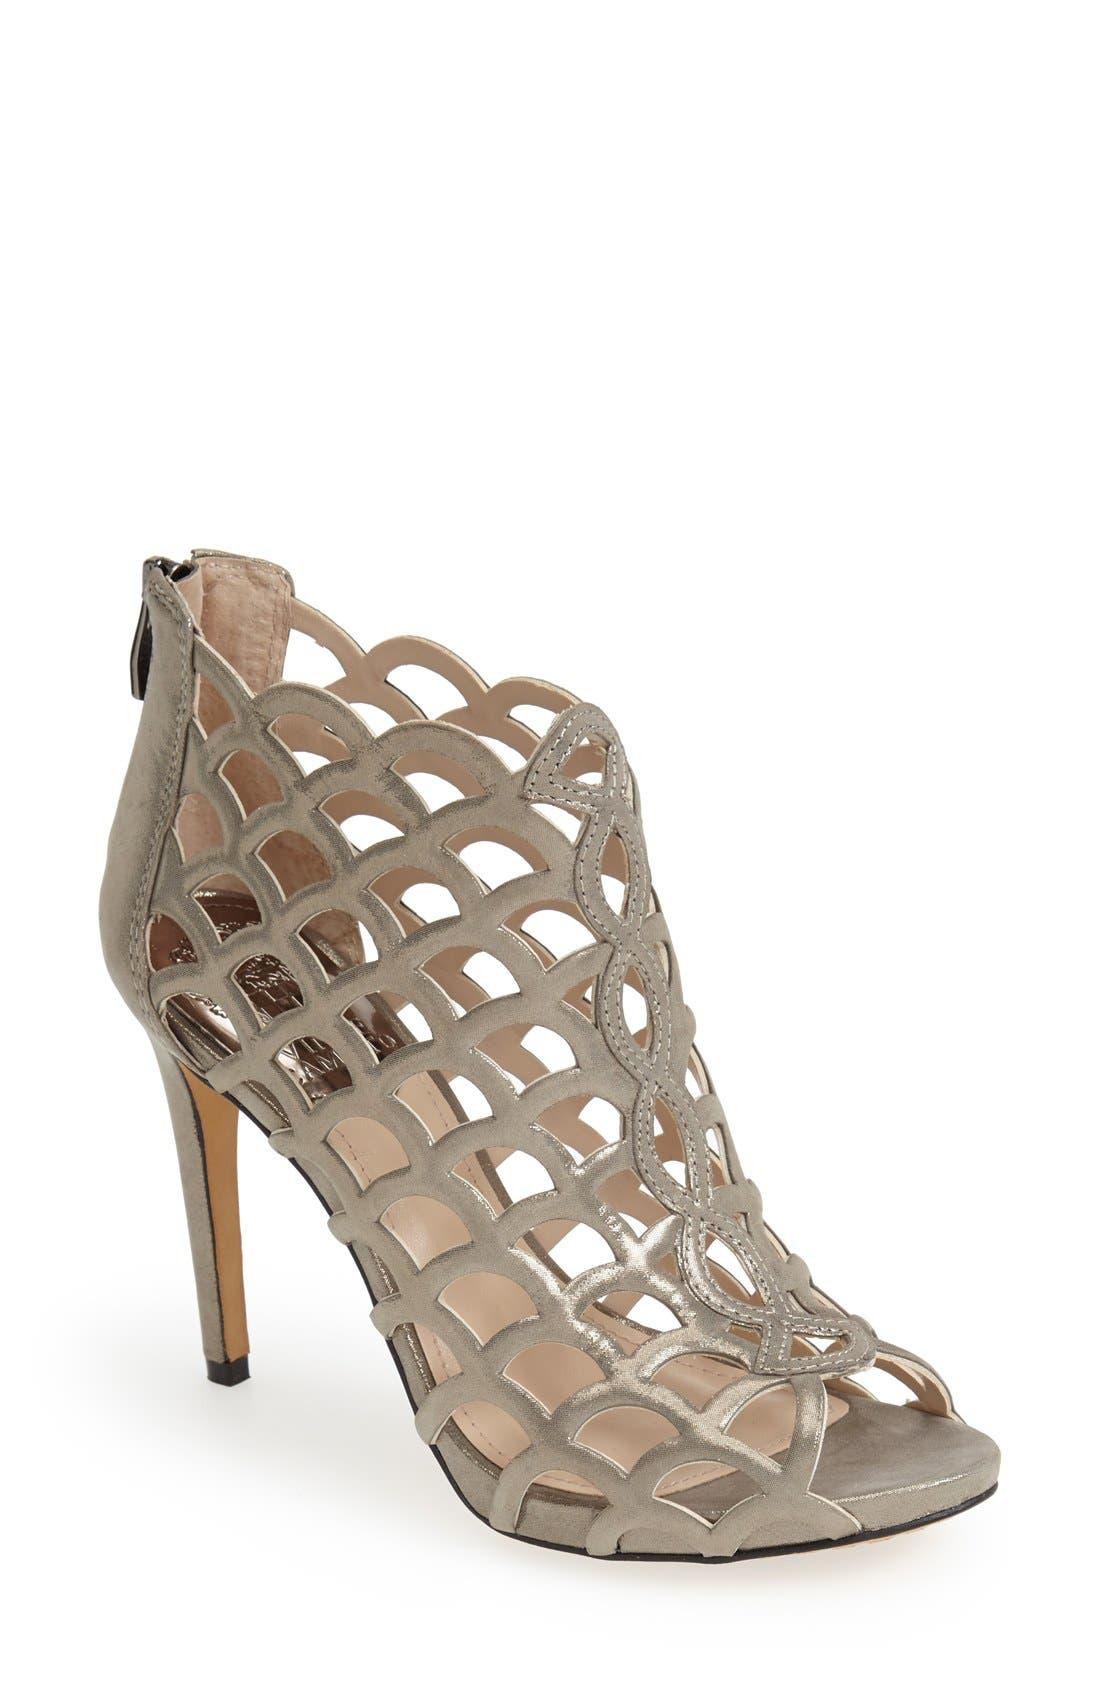 Alternate Image 1 Selected - Vince Camuto 'Fontanela' Sandal